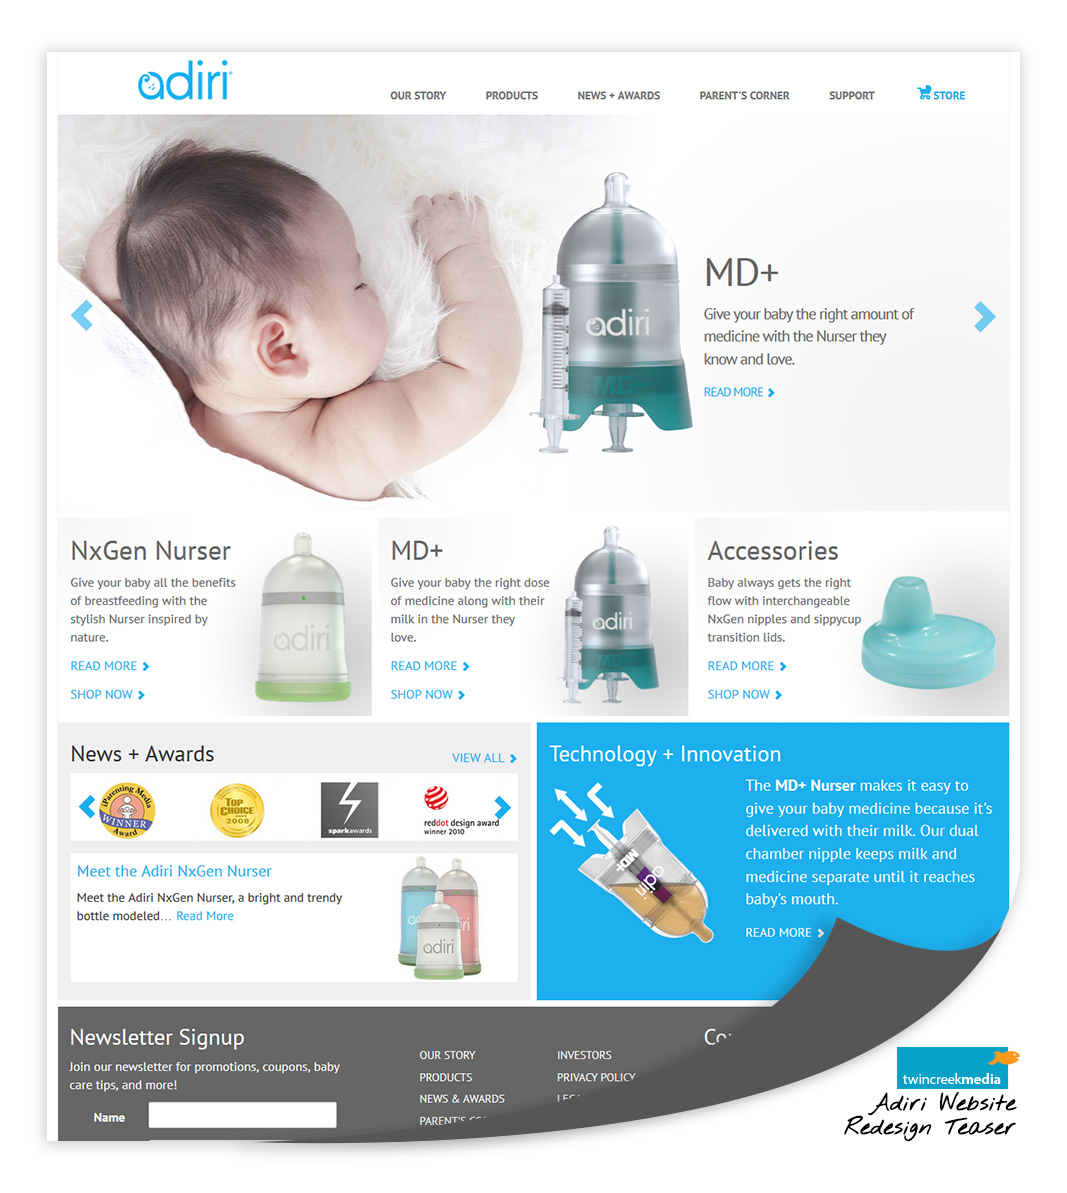 Adiri Kelowna Website by Twin Creek Media